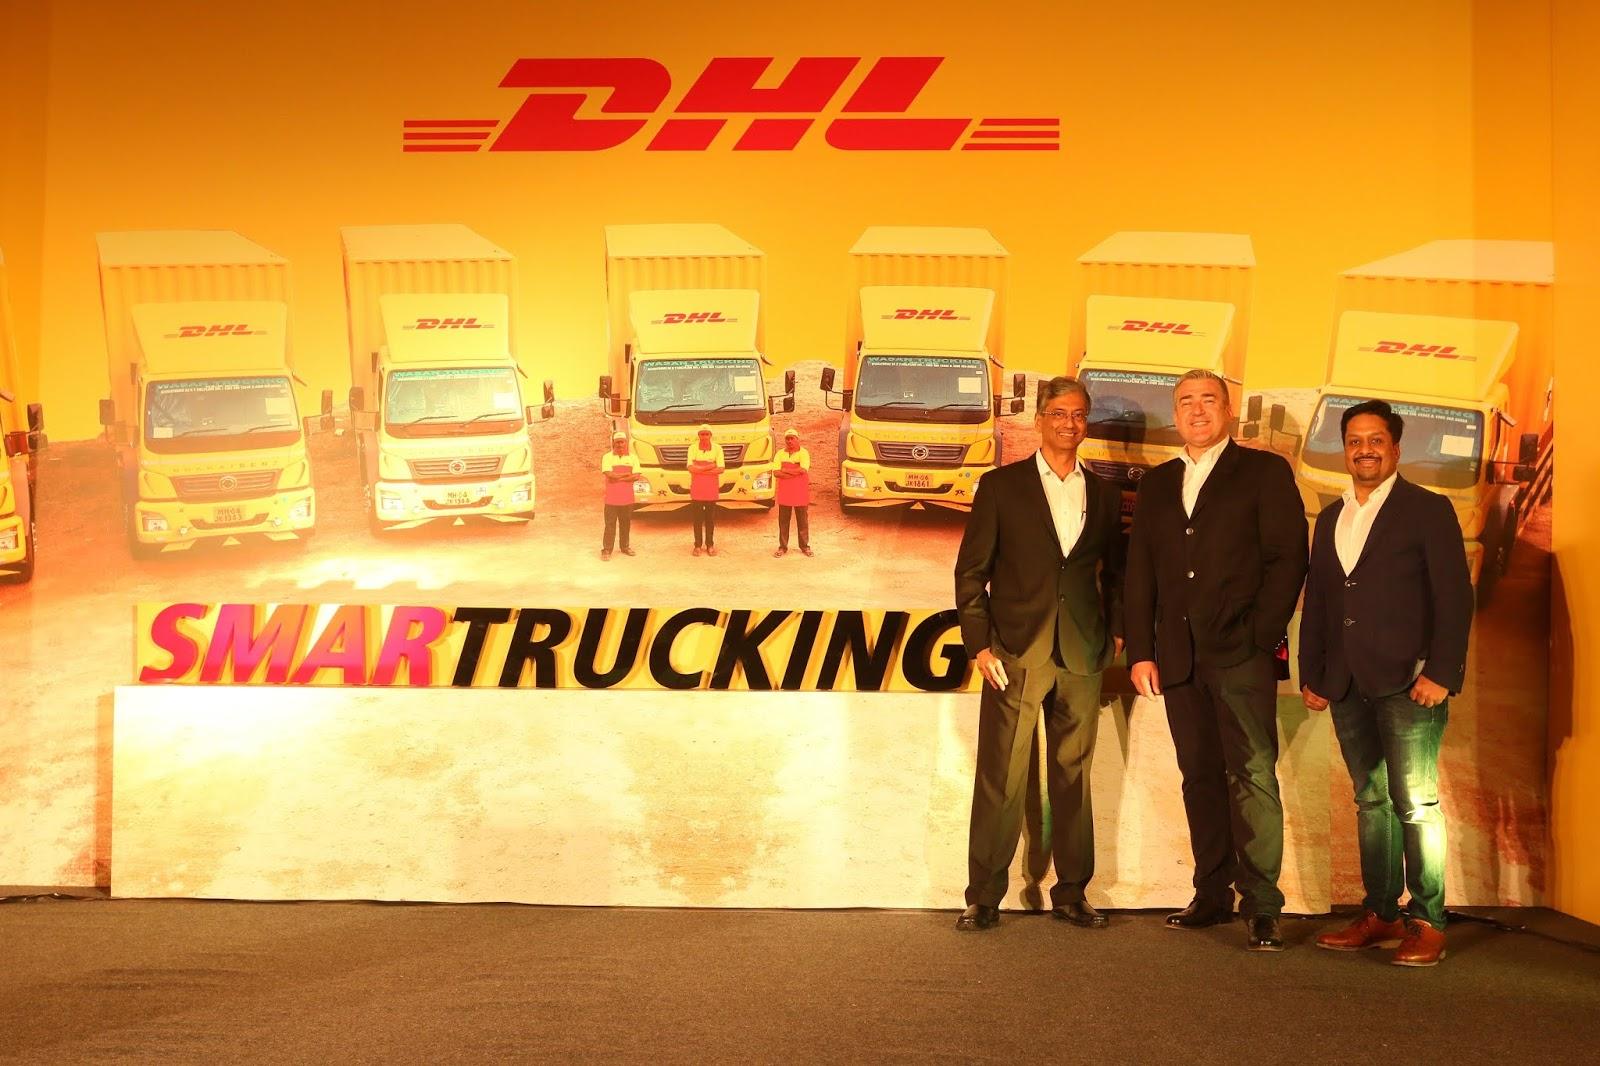 SPIRIT OF MUMBAI: DHL launches innovative road transportation across